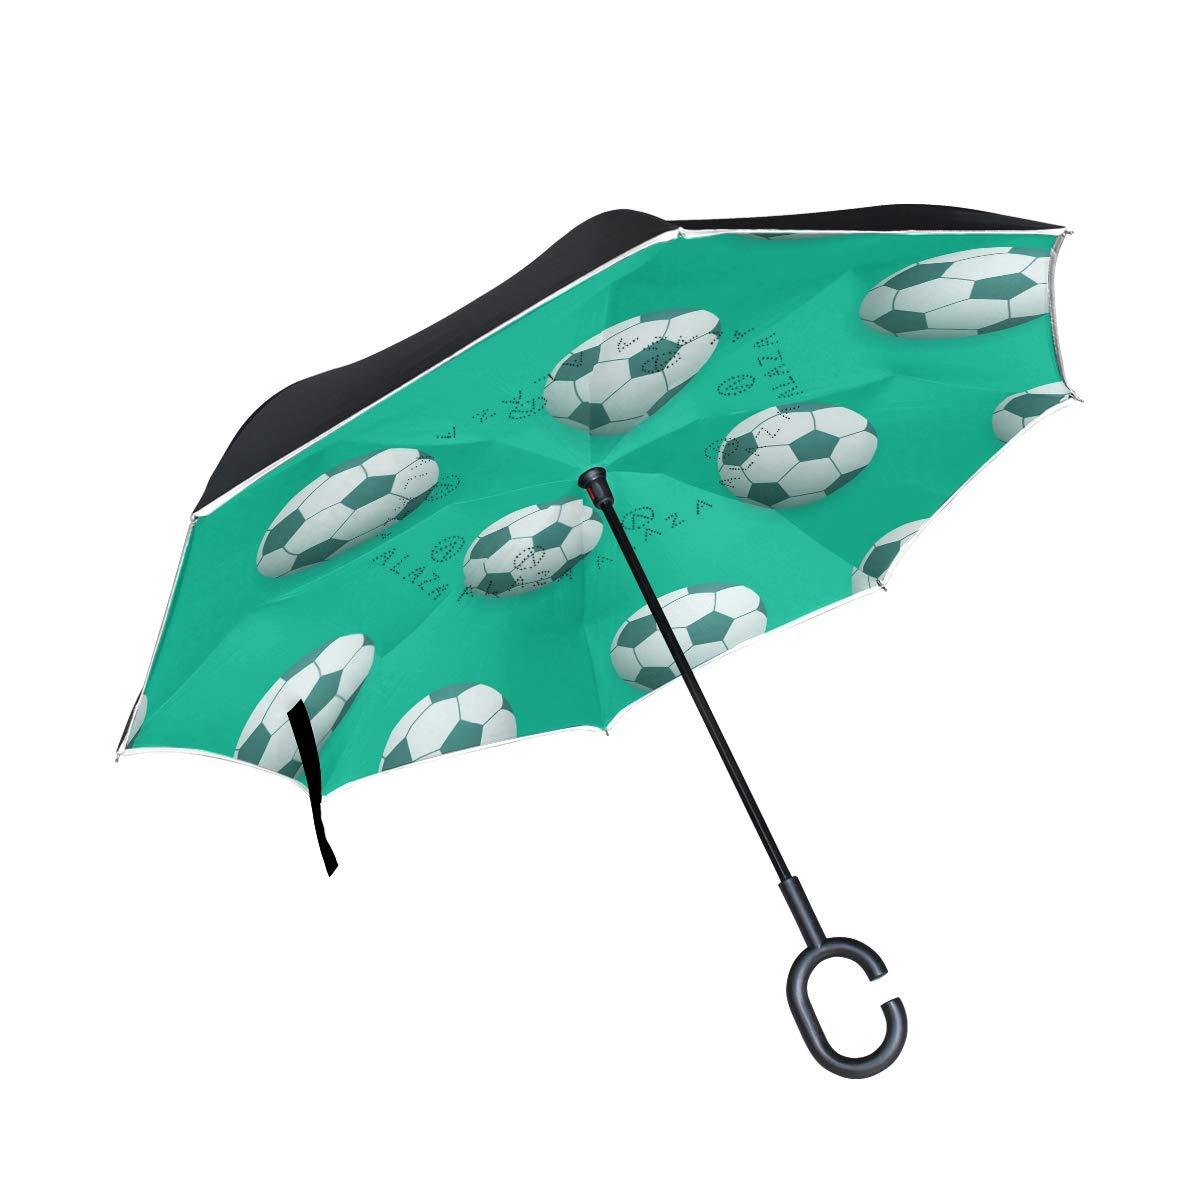 SKYDA Paraguas invertido de Doble Capa, Paraguas Plegable para ...